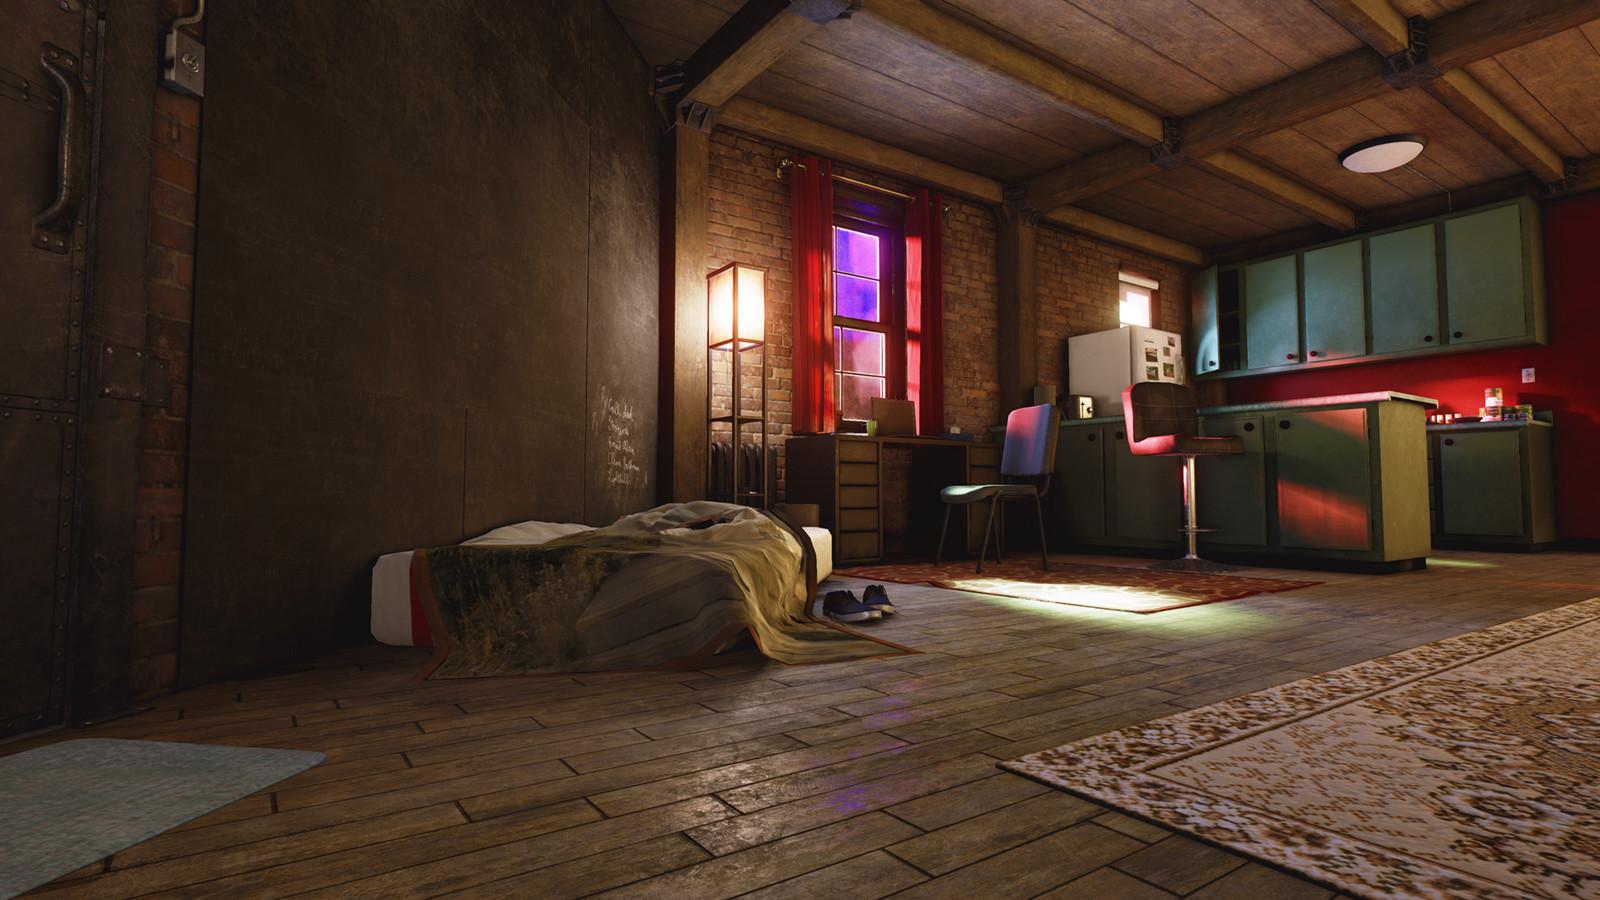 Ian Watson's Apartment